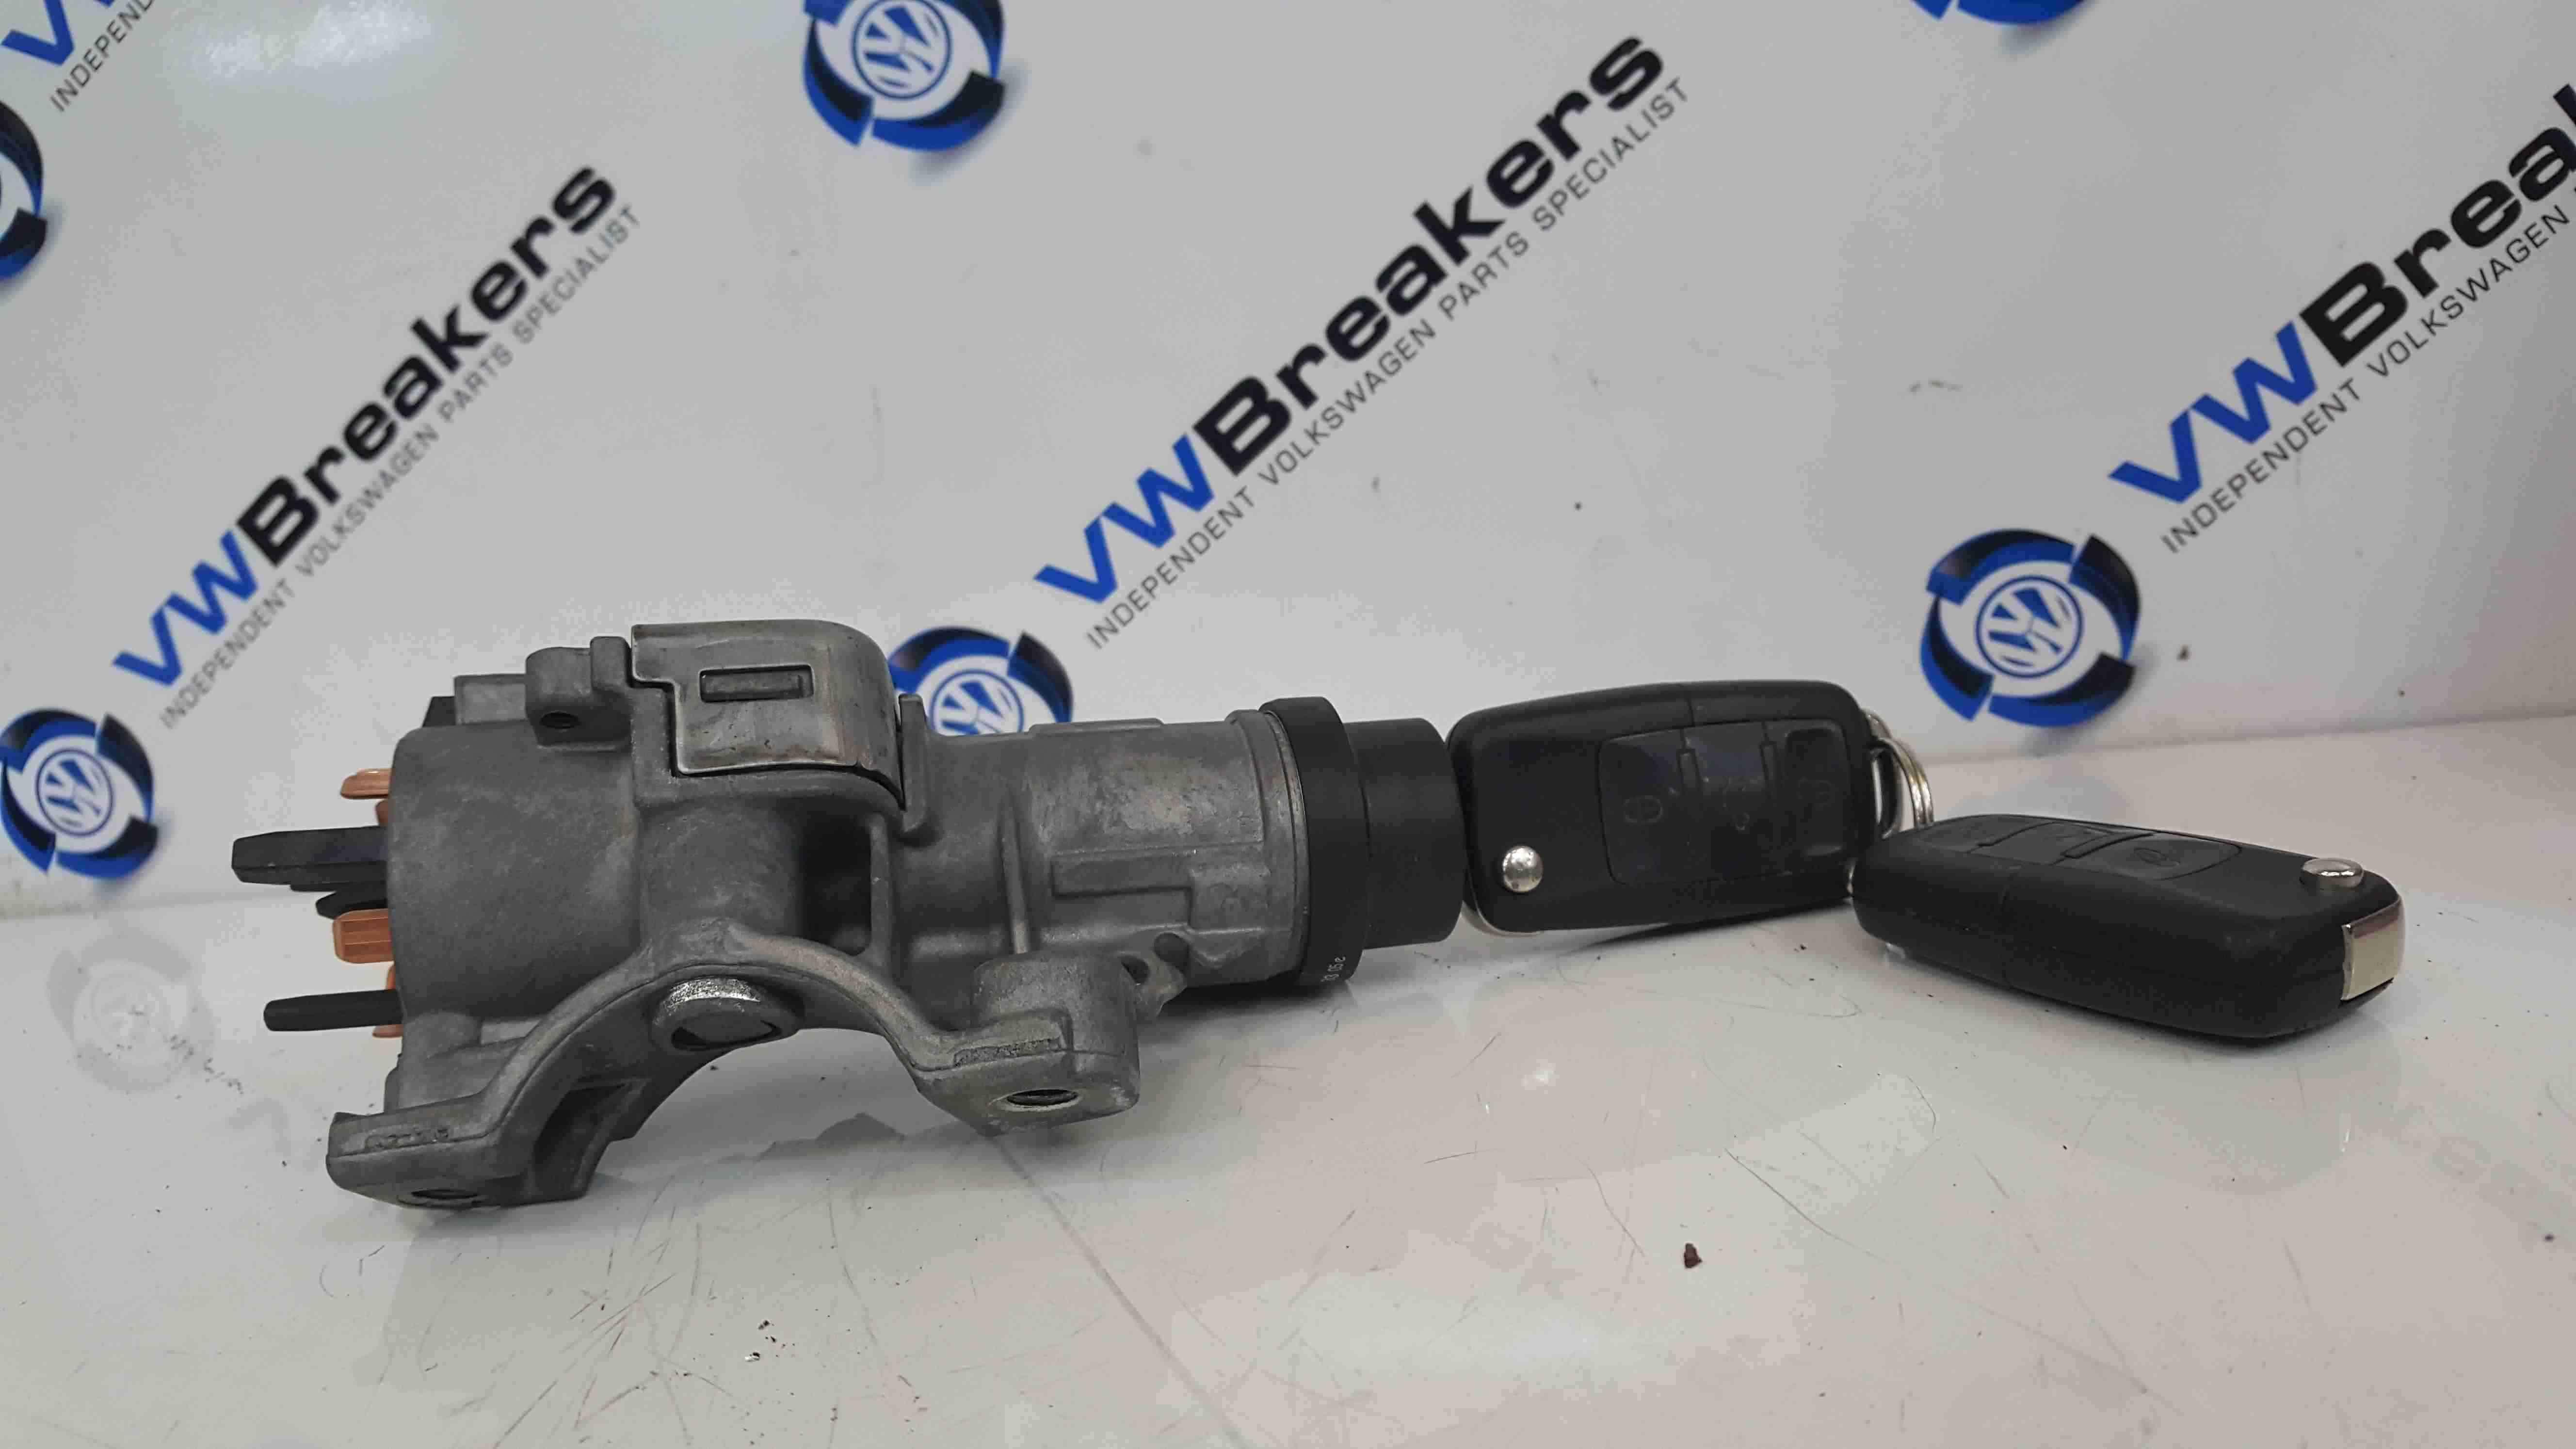 Volkswagen Polo 9N3 2006-2008 Ignition Barrel + 2 Keys 4B0905851N